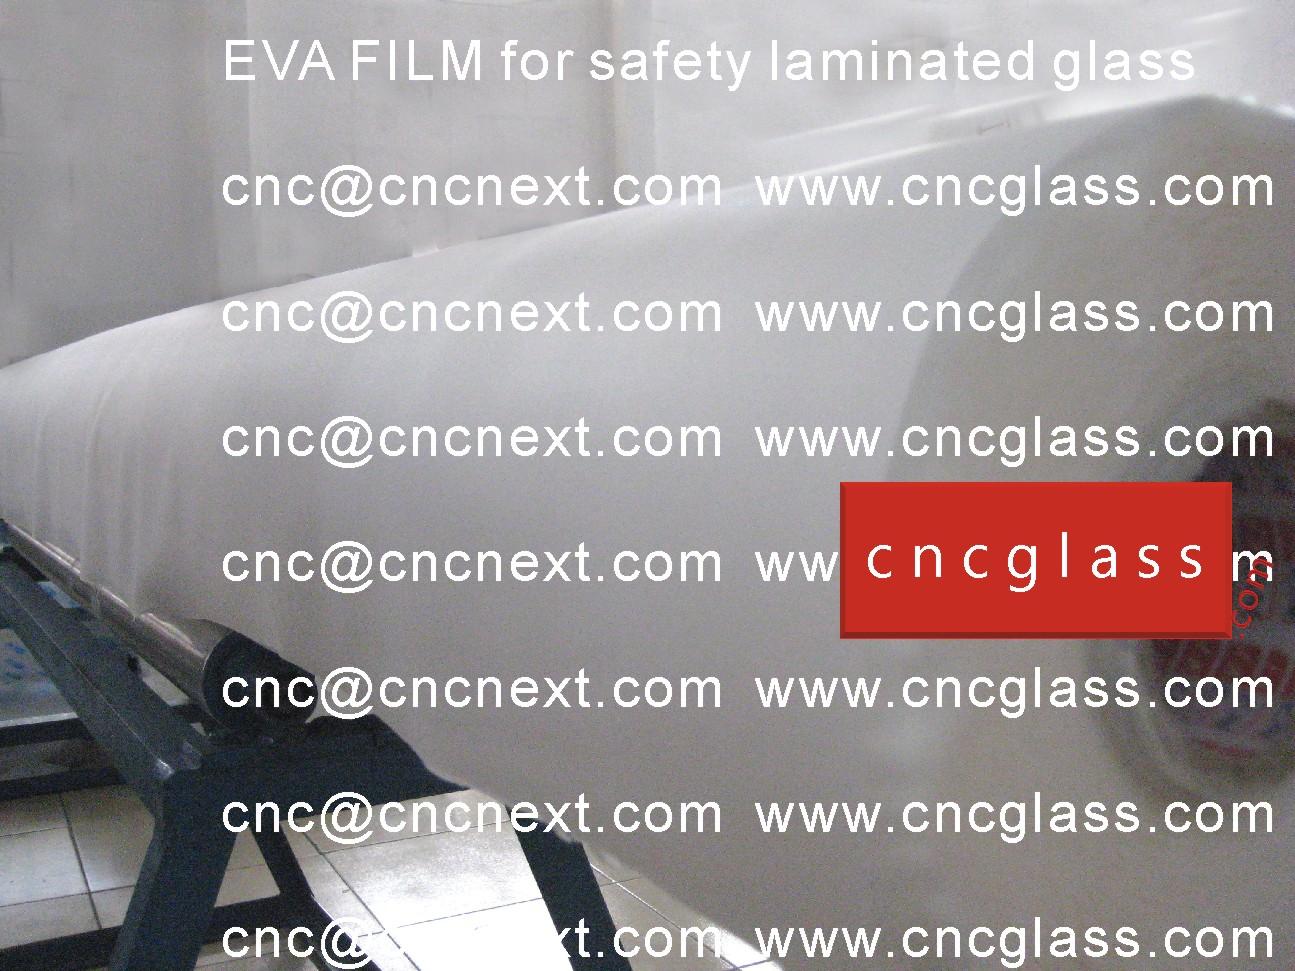 008 EVAFORCE EVA FILM FOR SAFETY LAMINATED GLASS